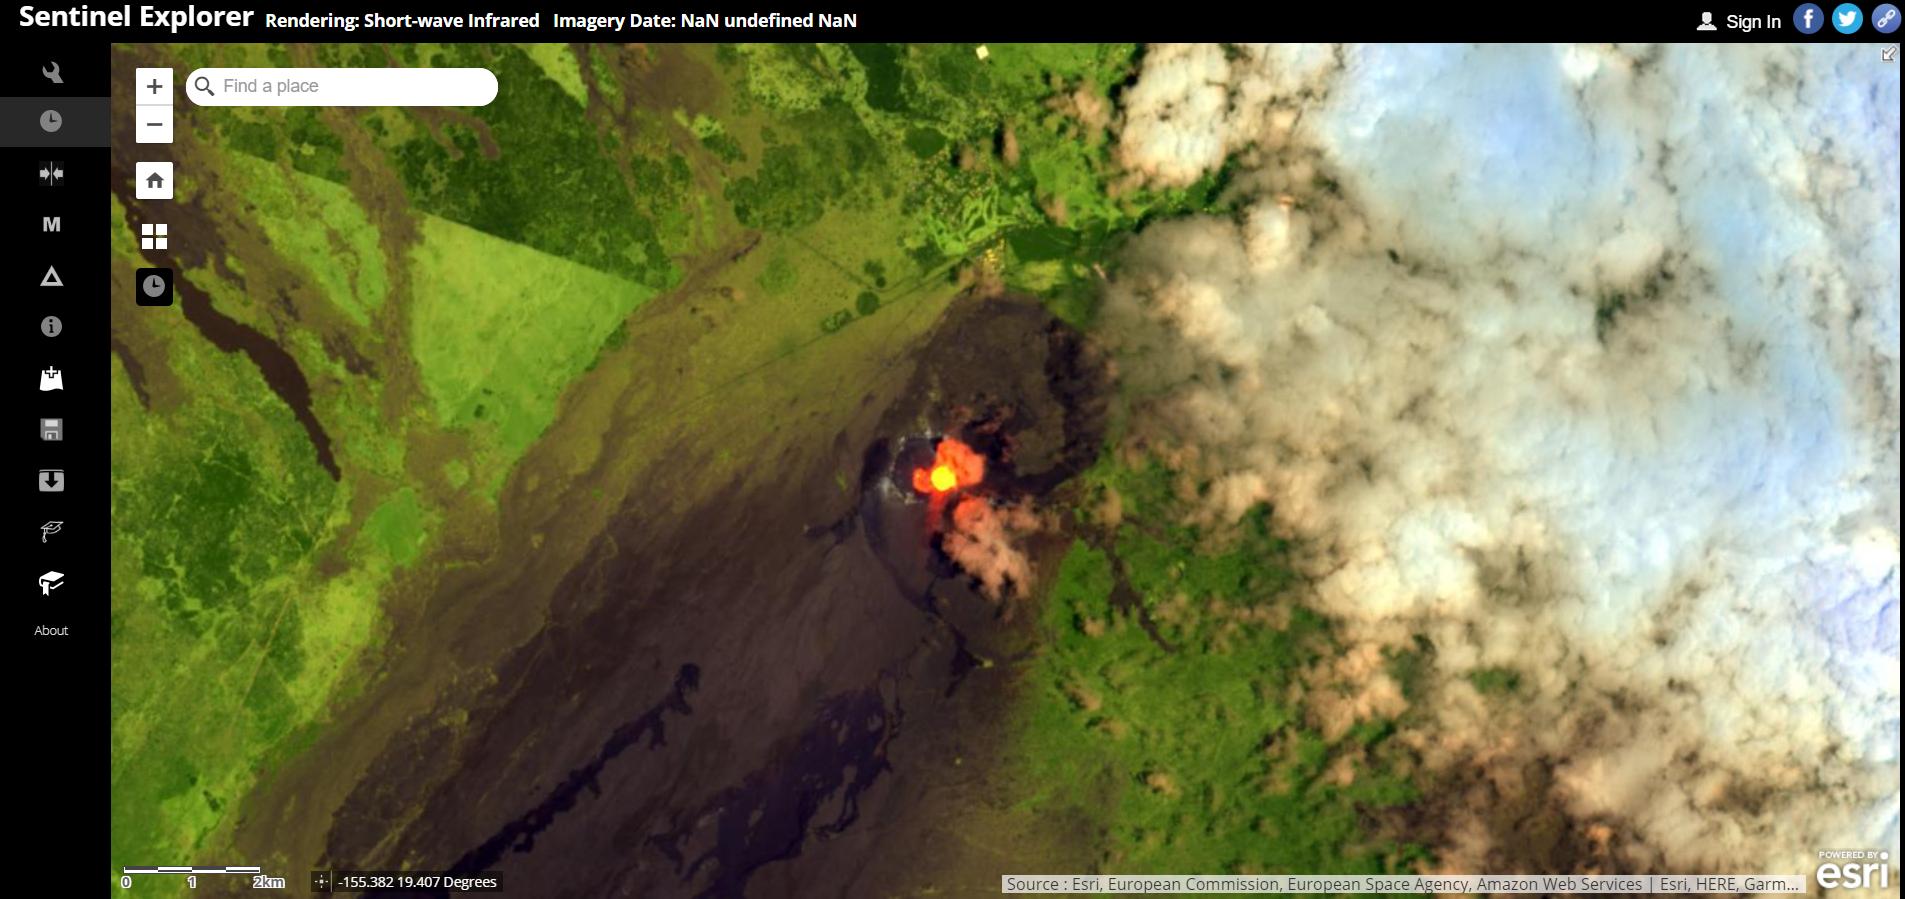 sentinel-2 explorer app. rendering short-wave infrared imagery.